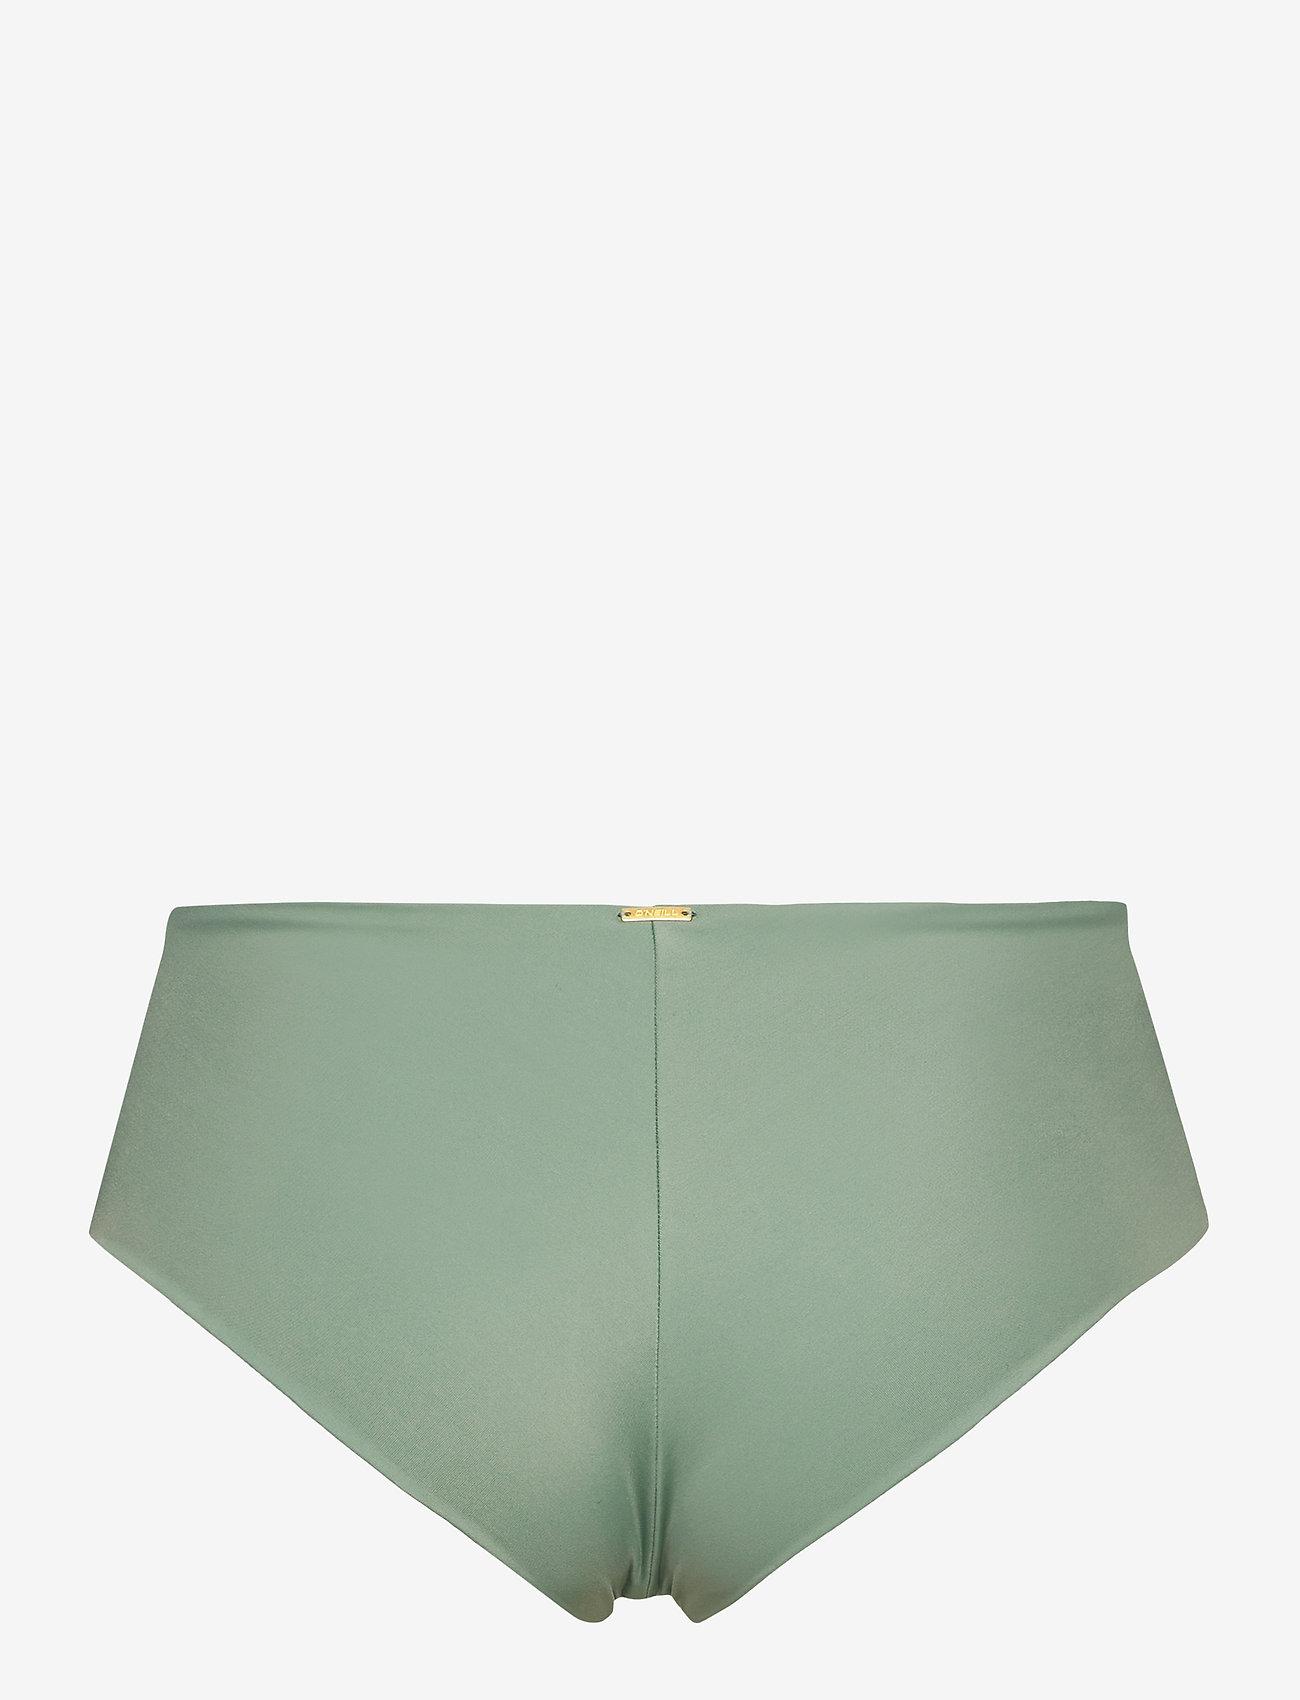 O'neill - PW MALTA BOTTOM - majtki bikini - lily pad - 1